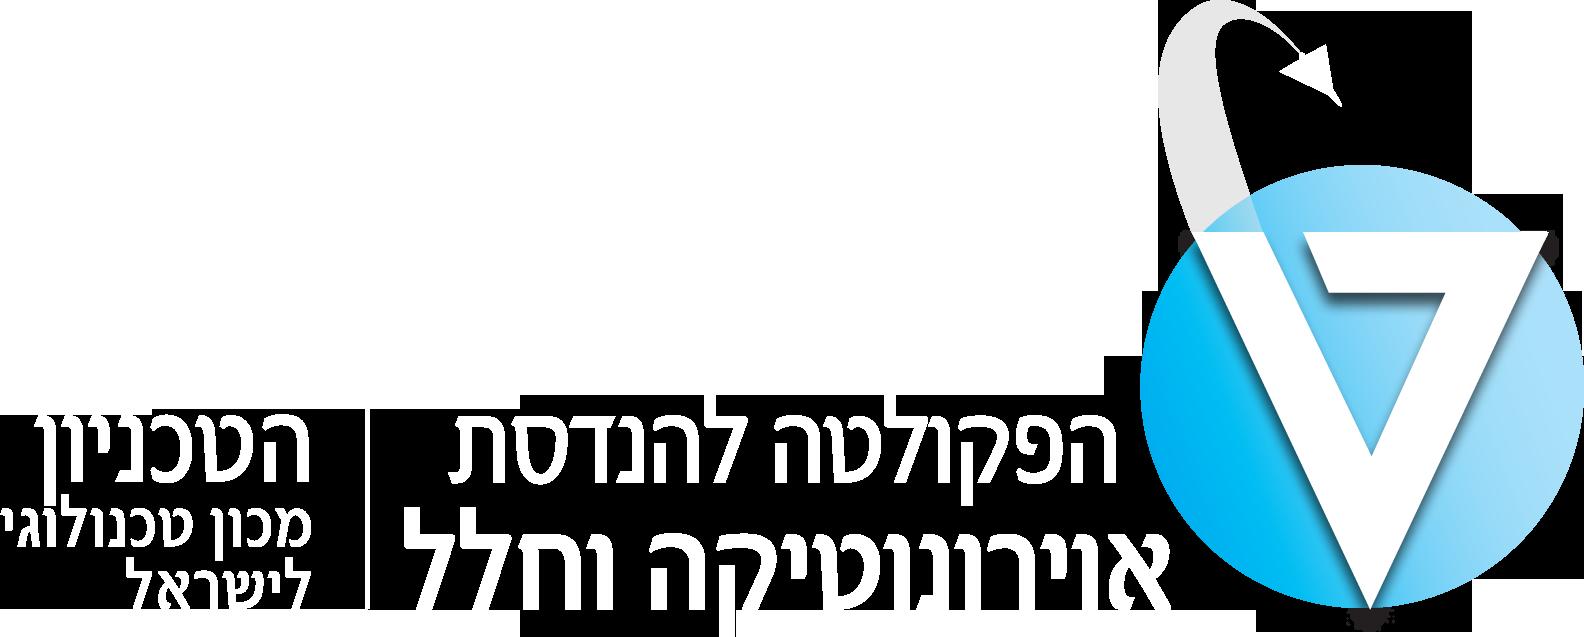 Negative logo